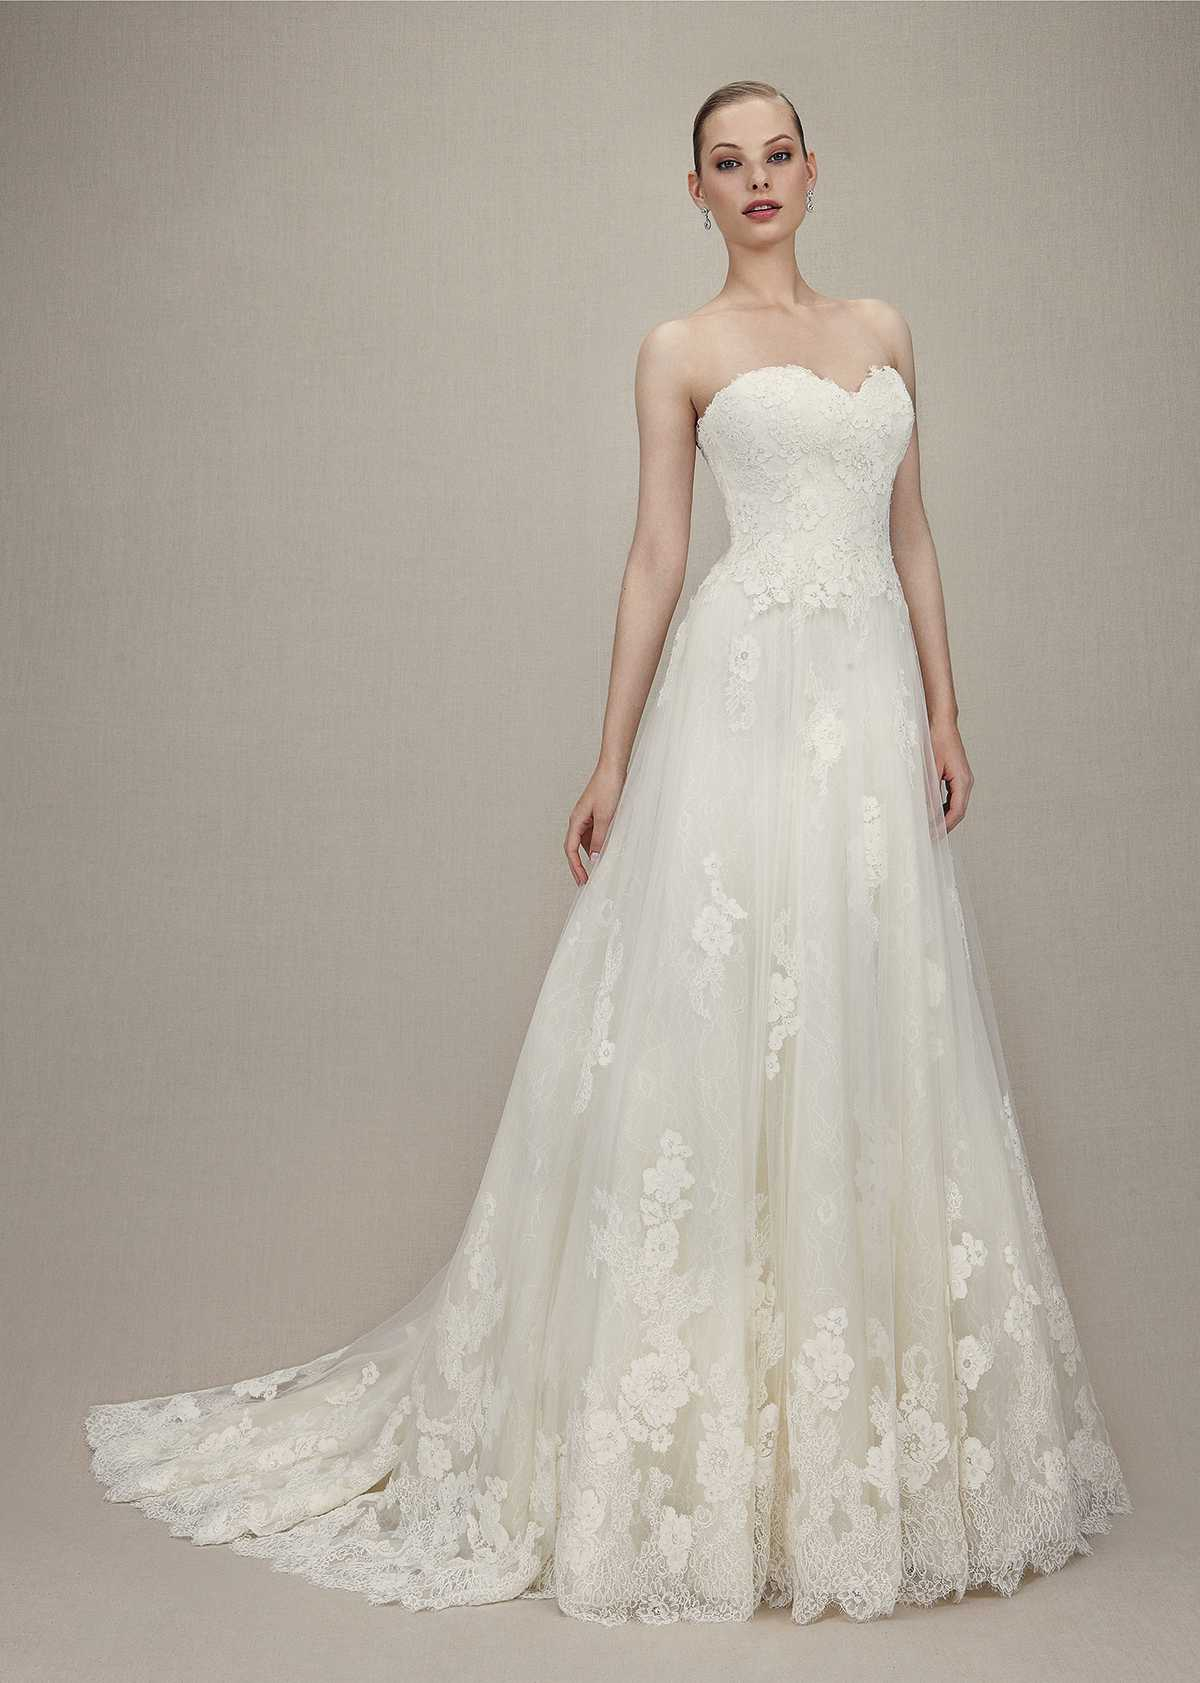 gloriosa-szalon-eskuvo-classic-menyasszonyi-ruha-korte.jpg